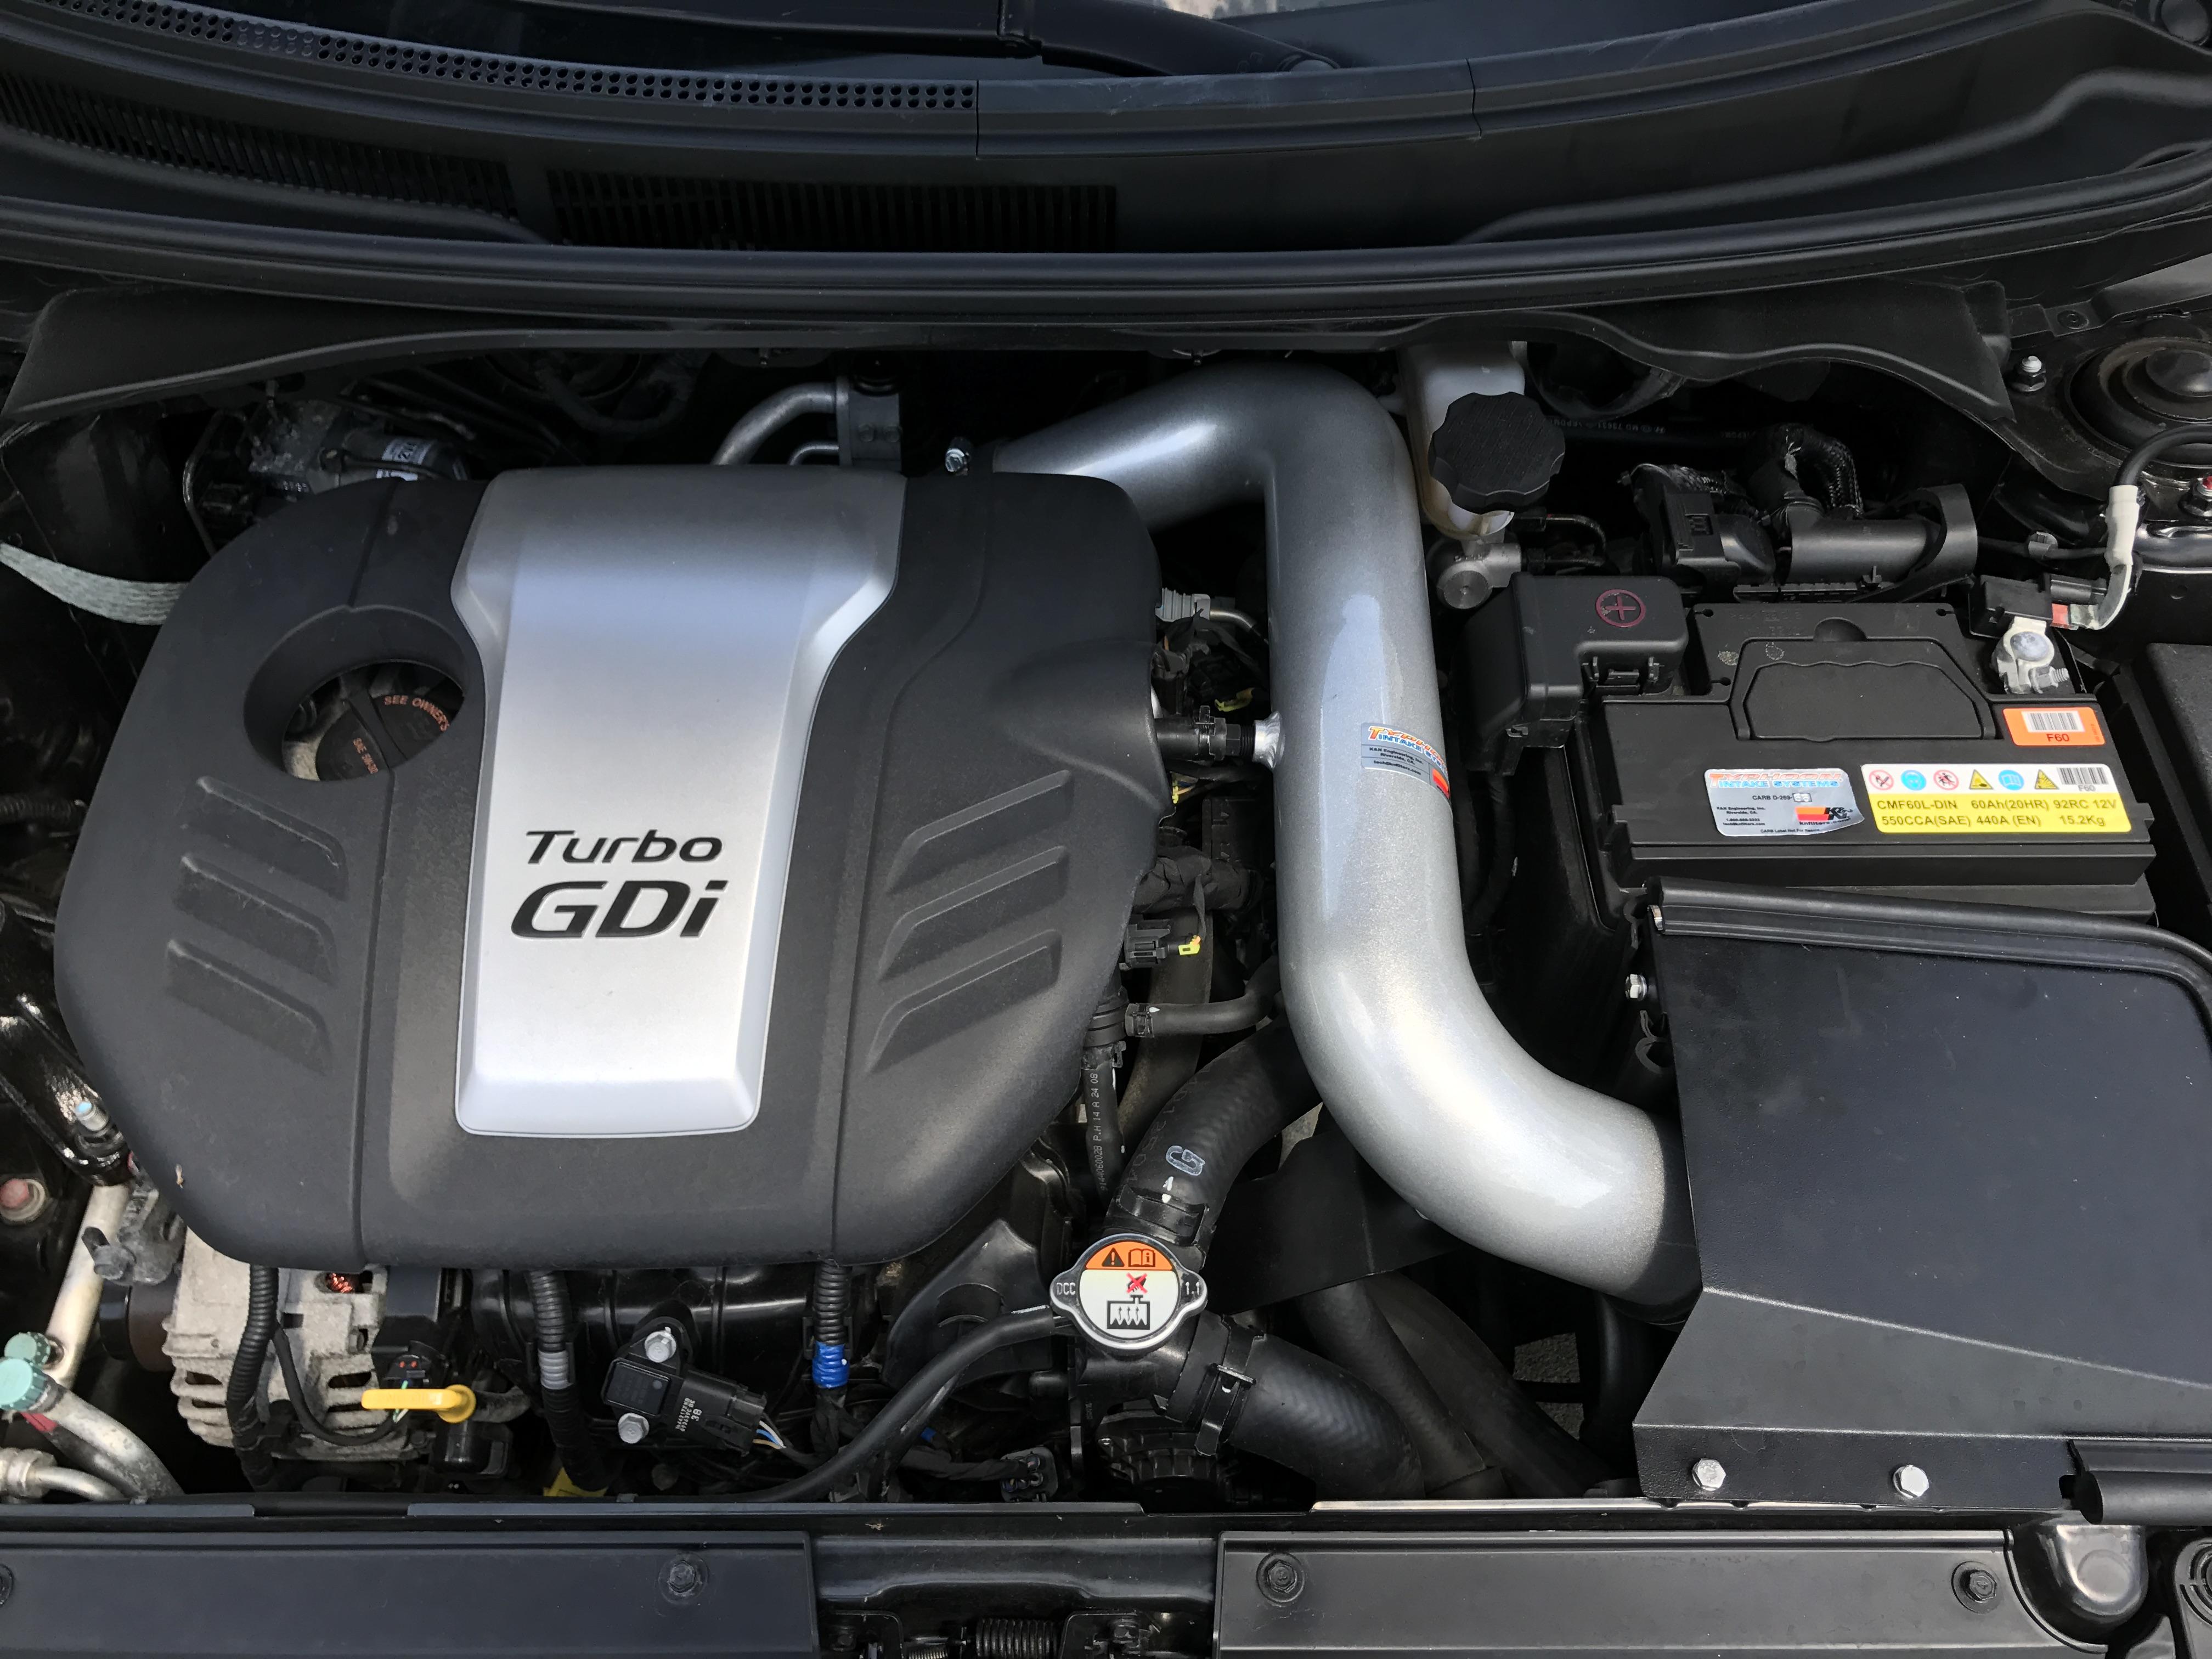 Added a $275 K&N Air Intake that adds 20 HP on dyno